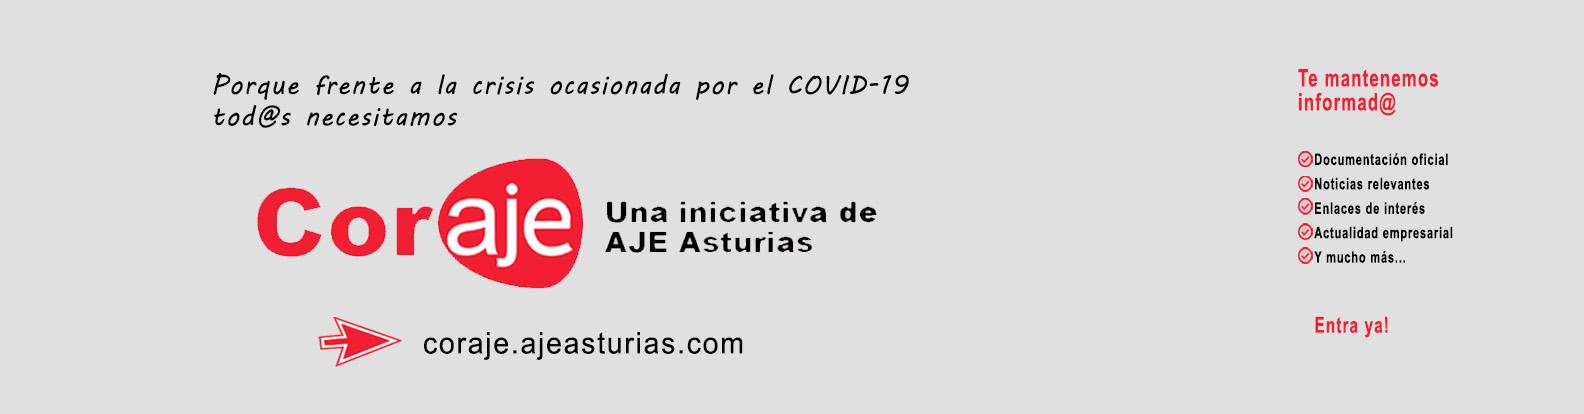 coraje coronavirus